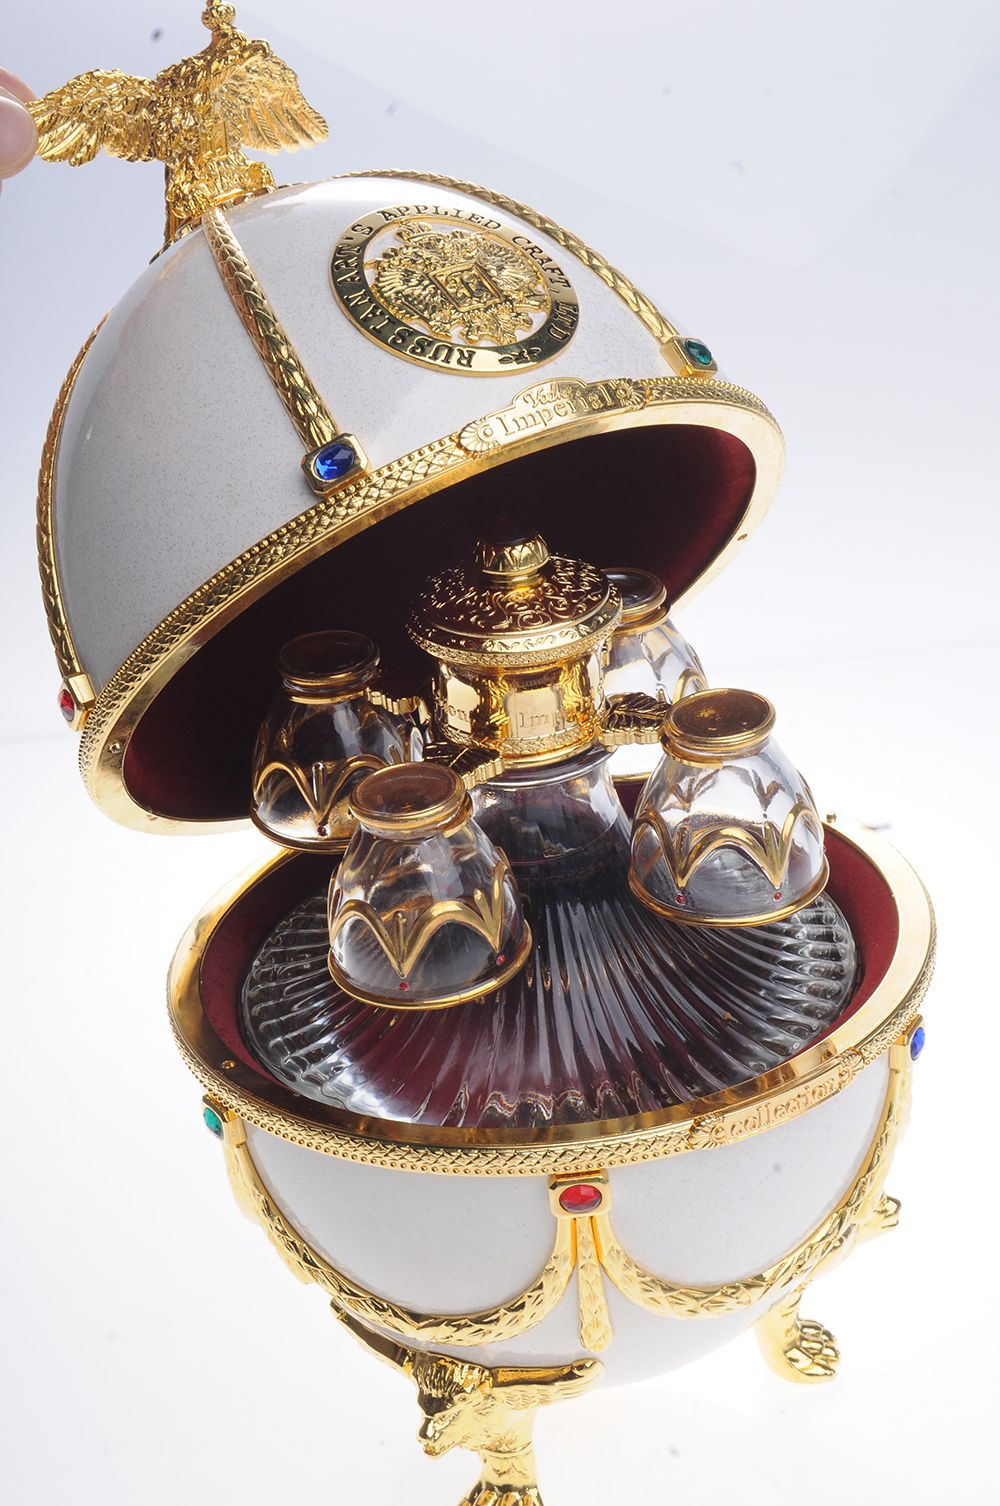 Vodka Imperial Collection estilo Ovo Fabergé, luxo puro em: http://terapiadoluxo.com.br/vodka-imperial-collection-estilo-ovo-faberge/